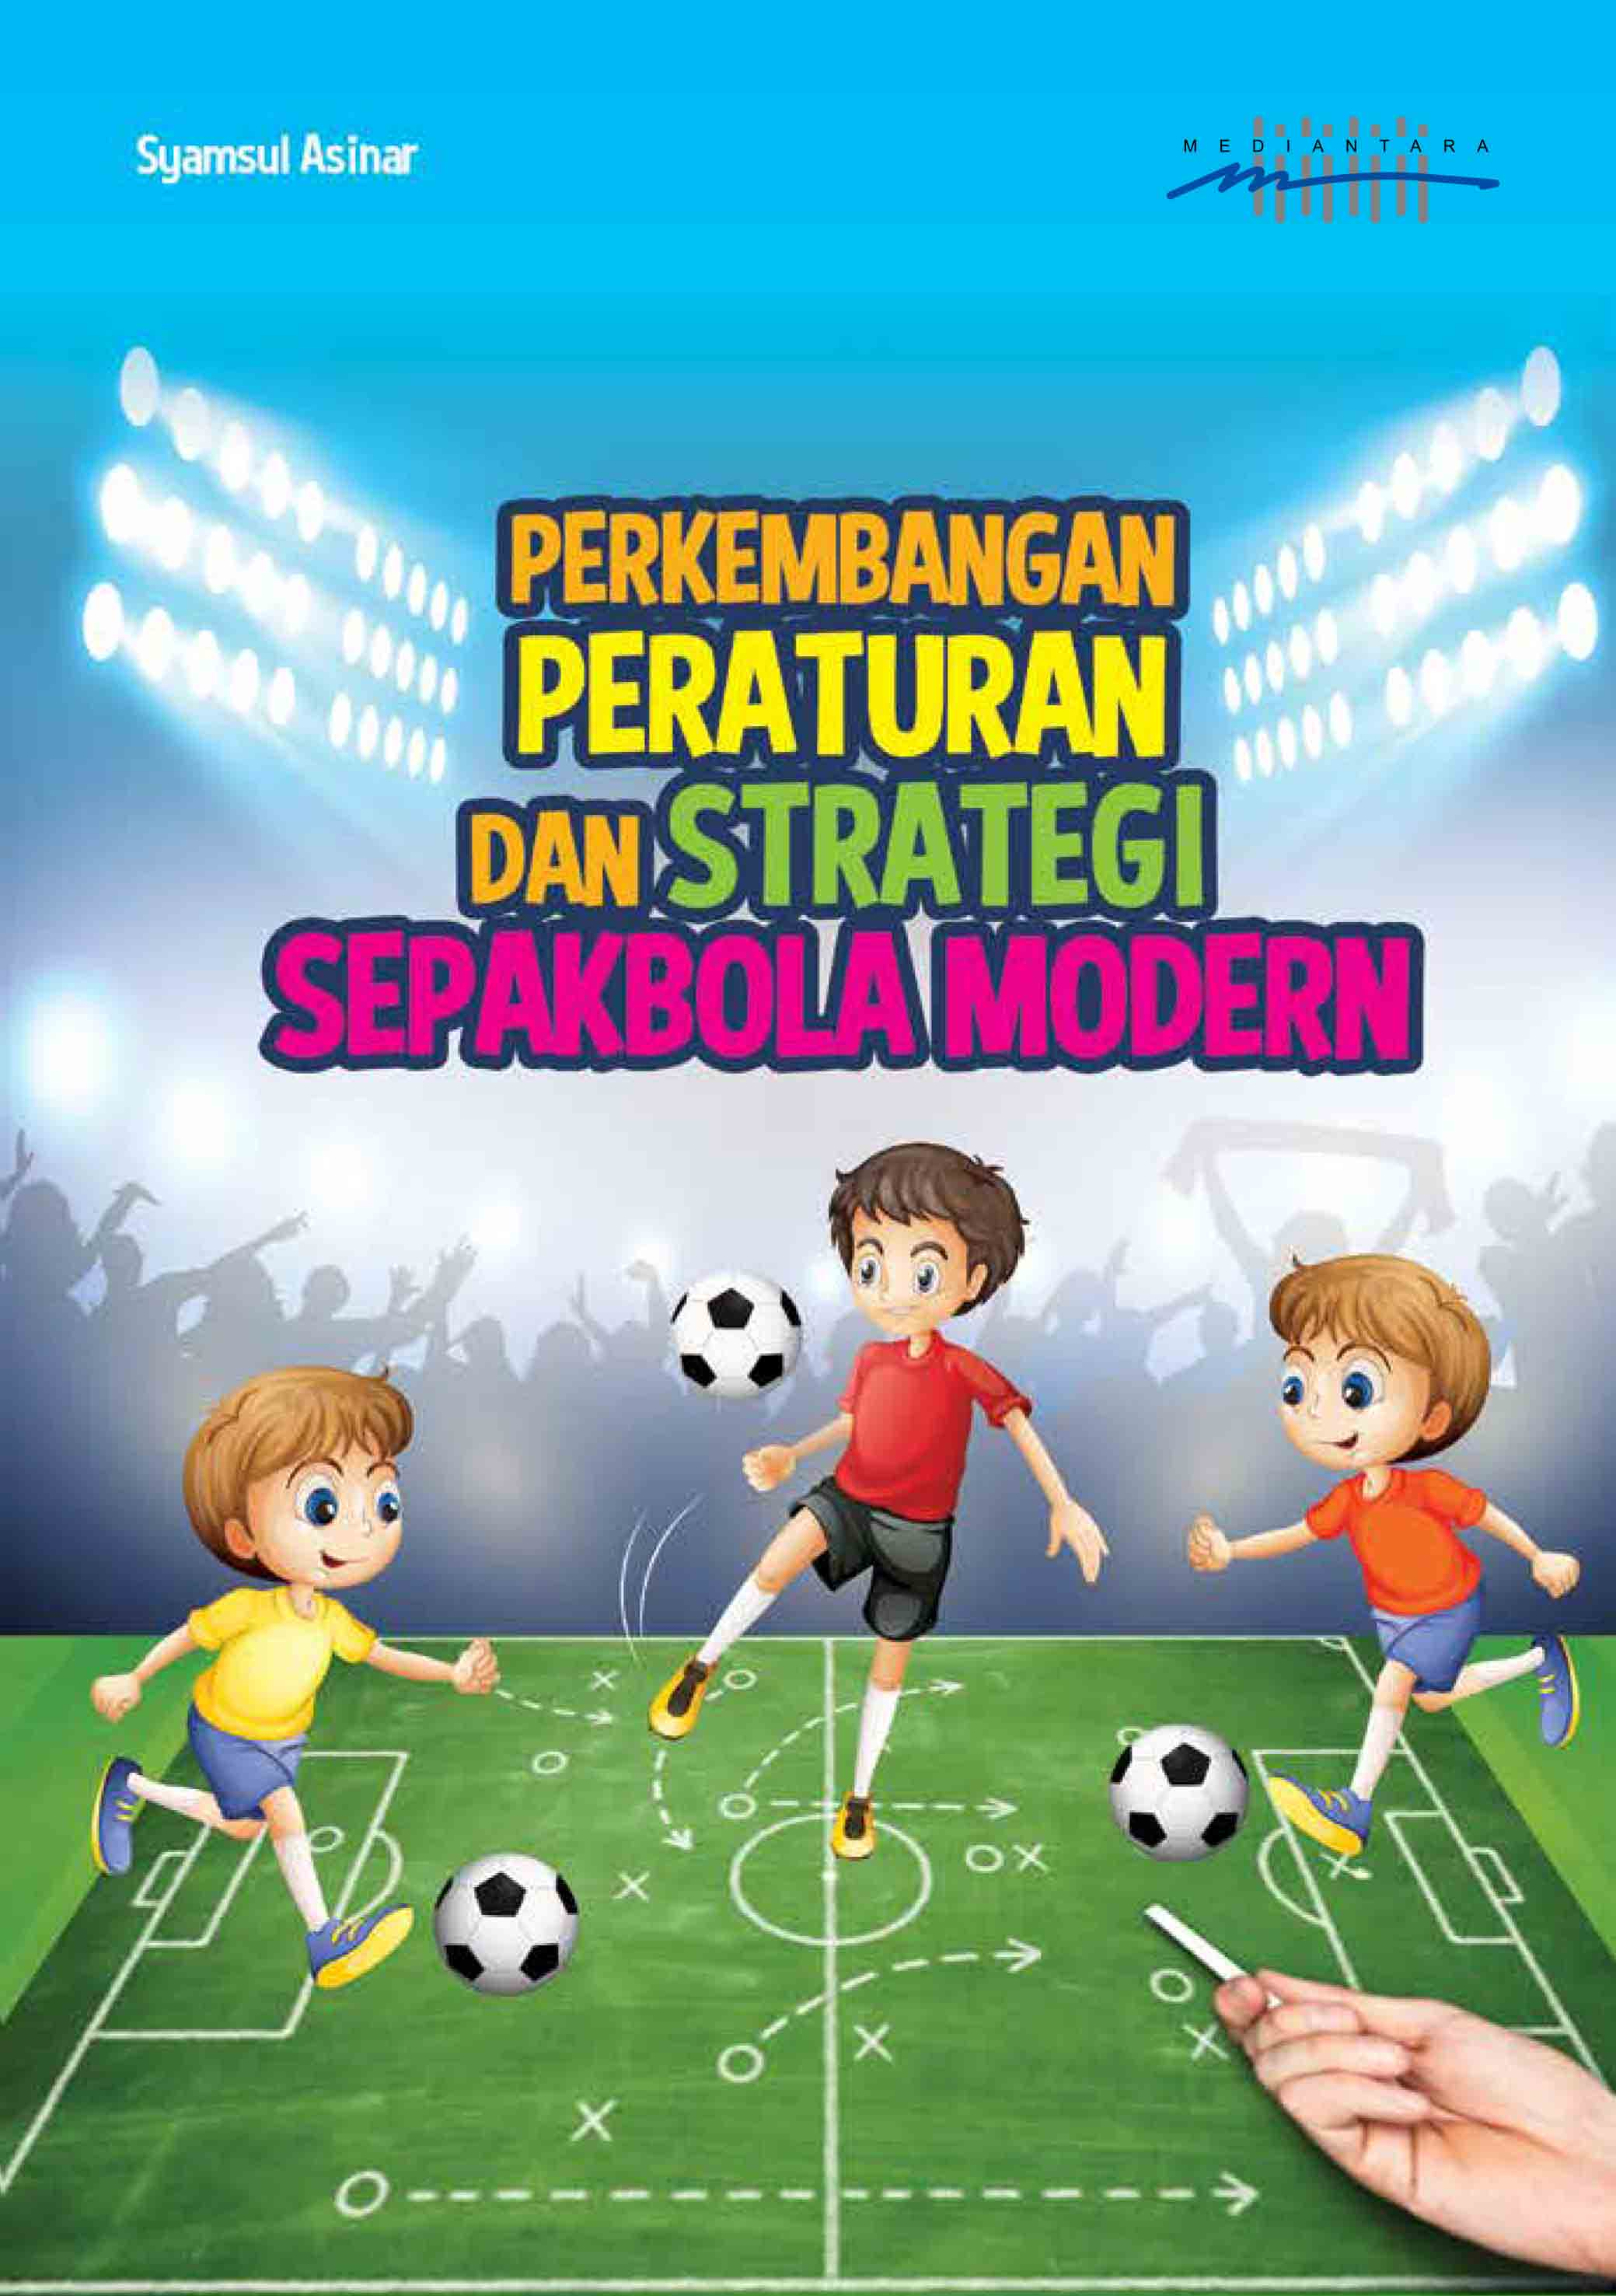 Perkembangan peraturan dan strategi sepak bola modern [sumber elektronis]